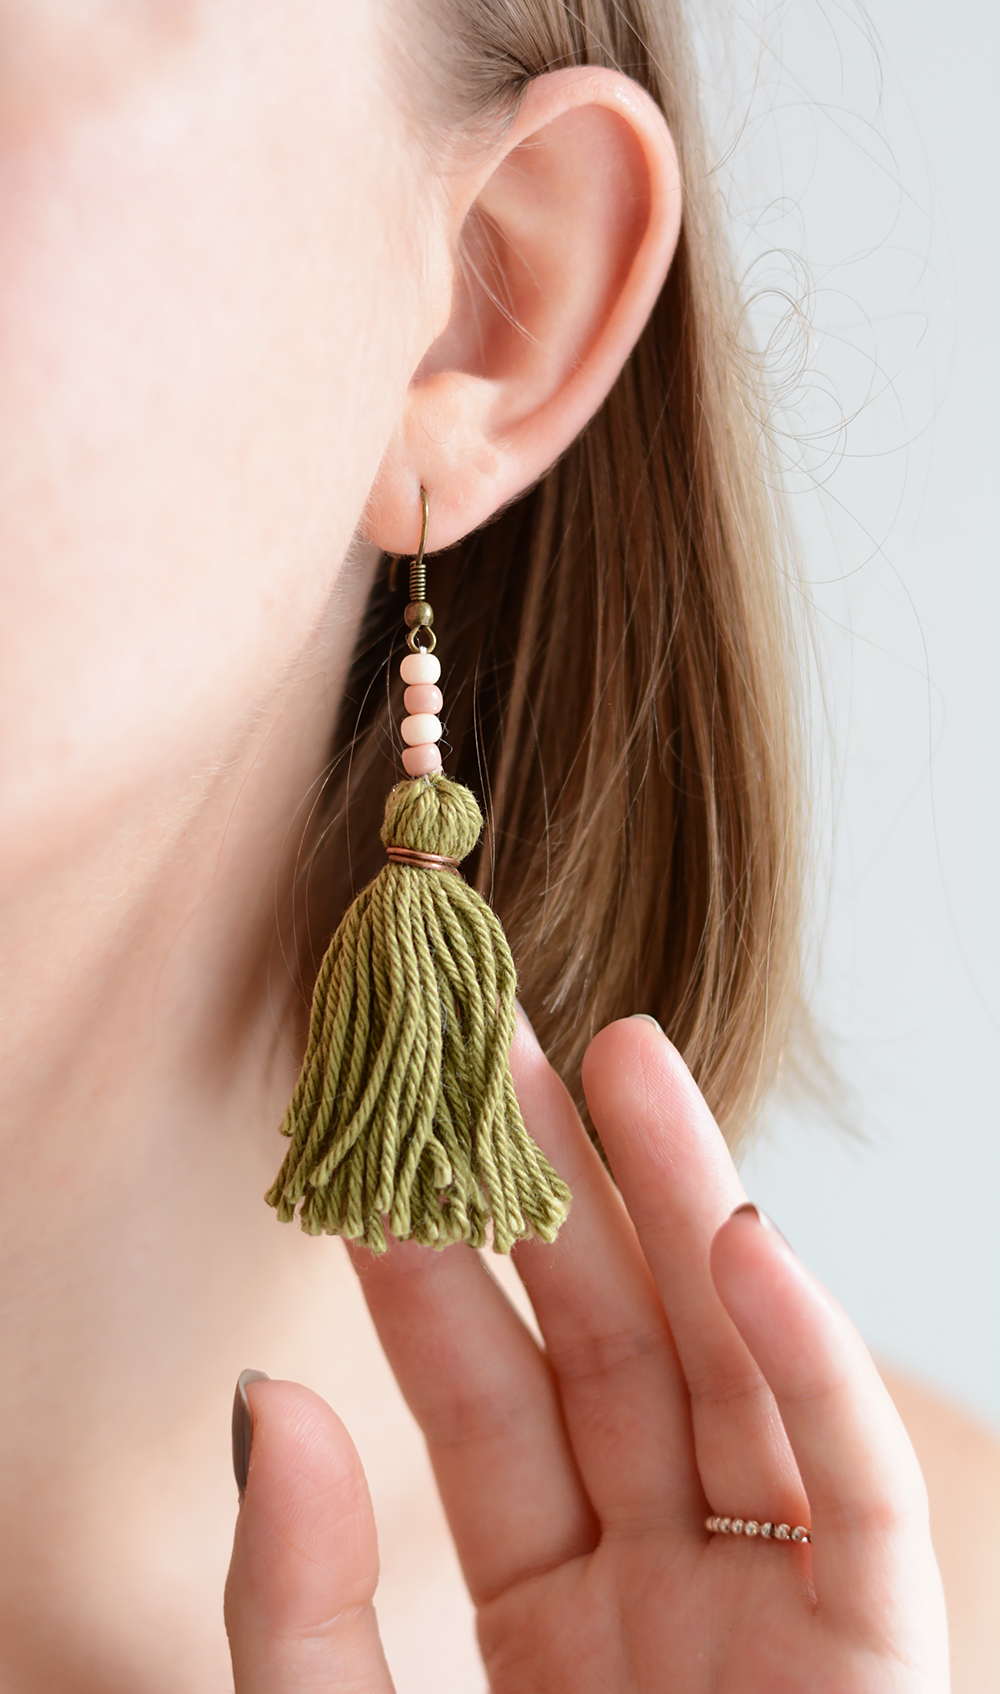 Tassel-Ohrringe: DIY-Tutorial | we love handmade